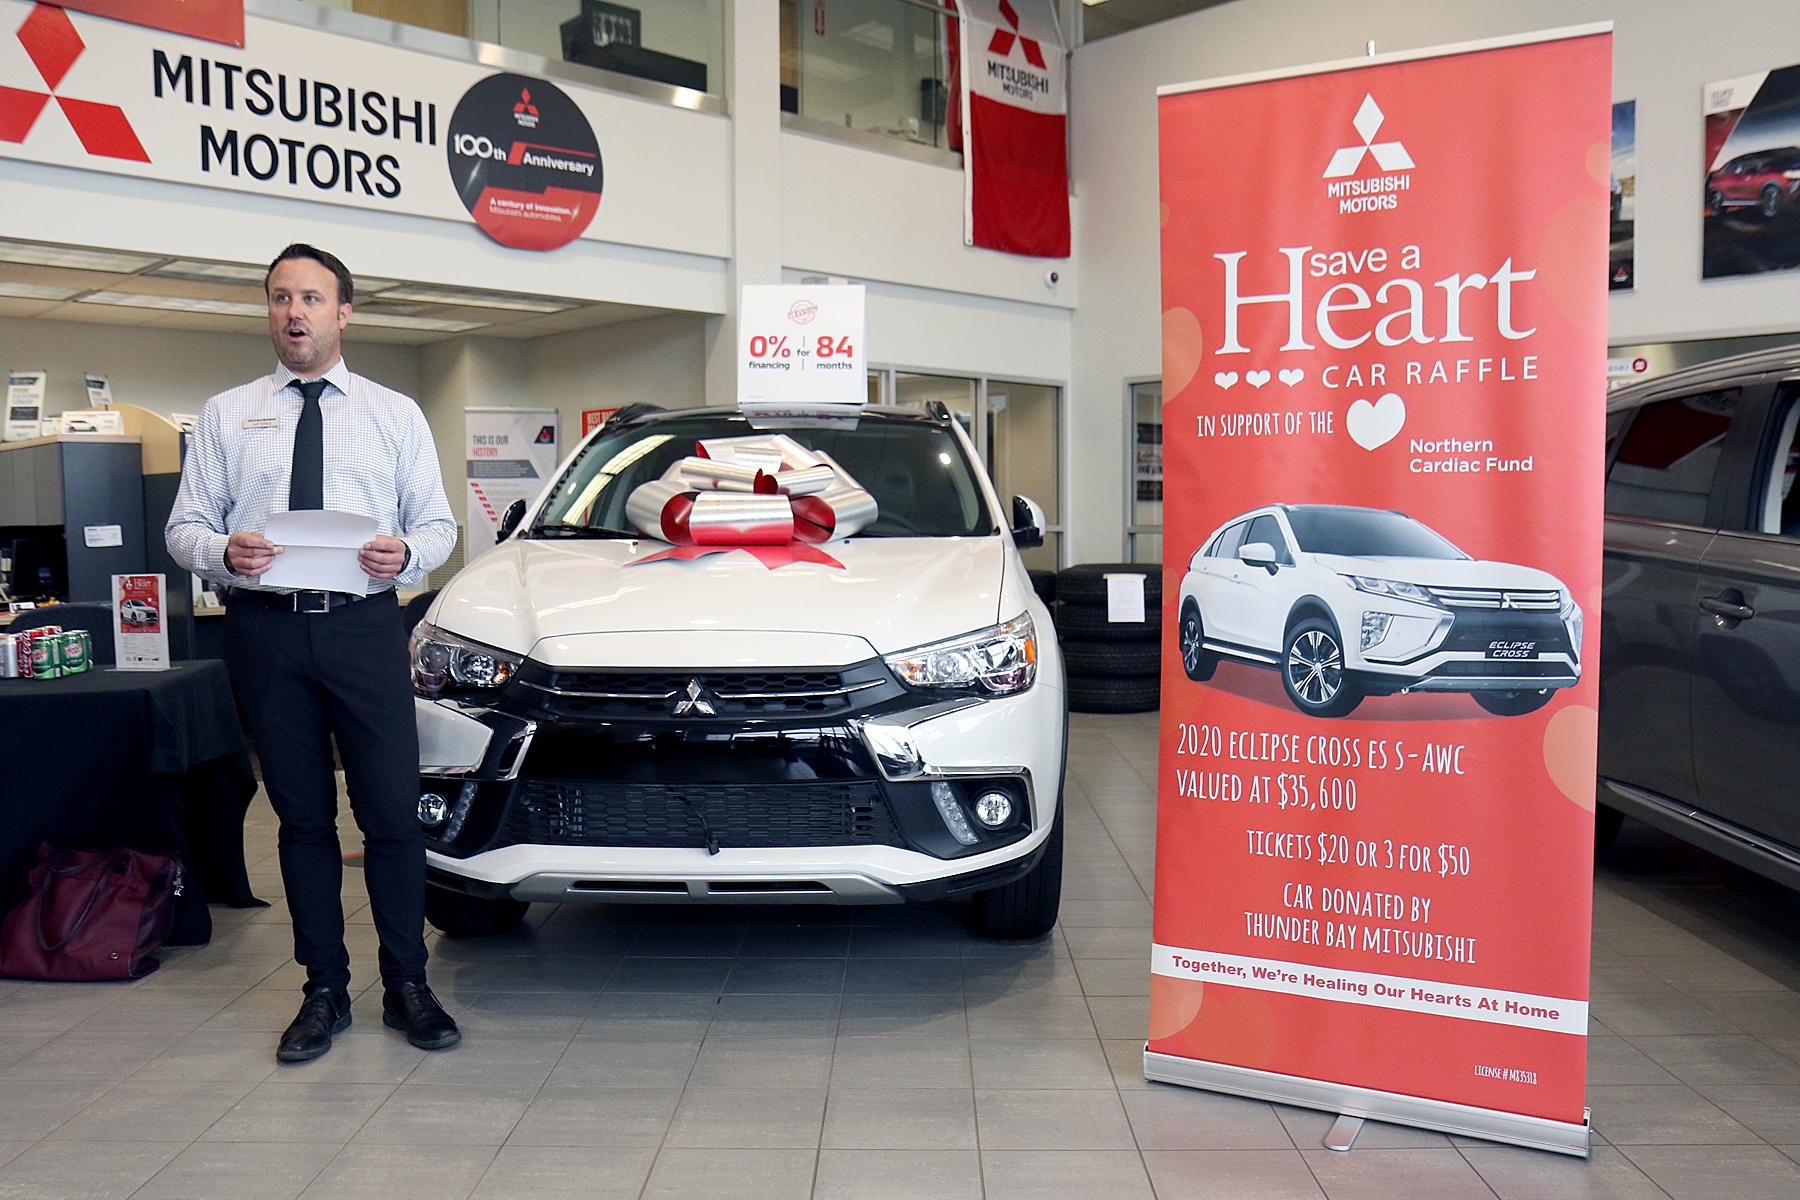 Save a Heart Car Raffle returns